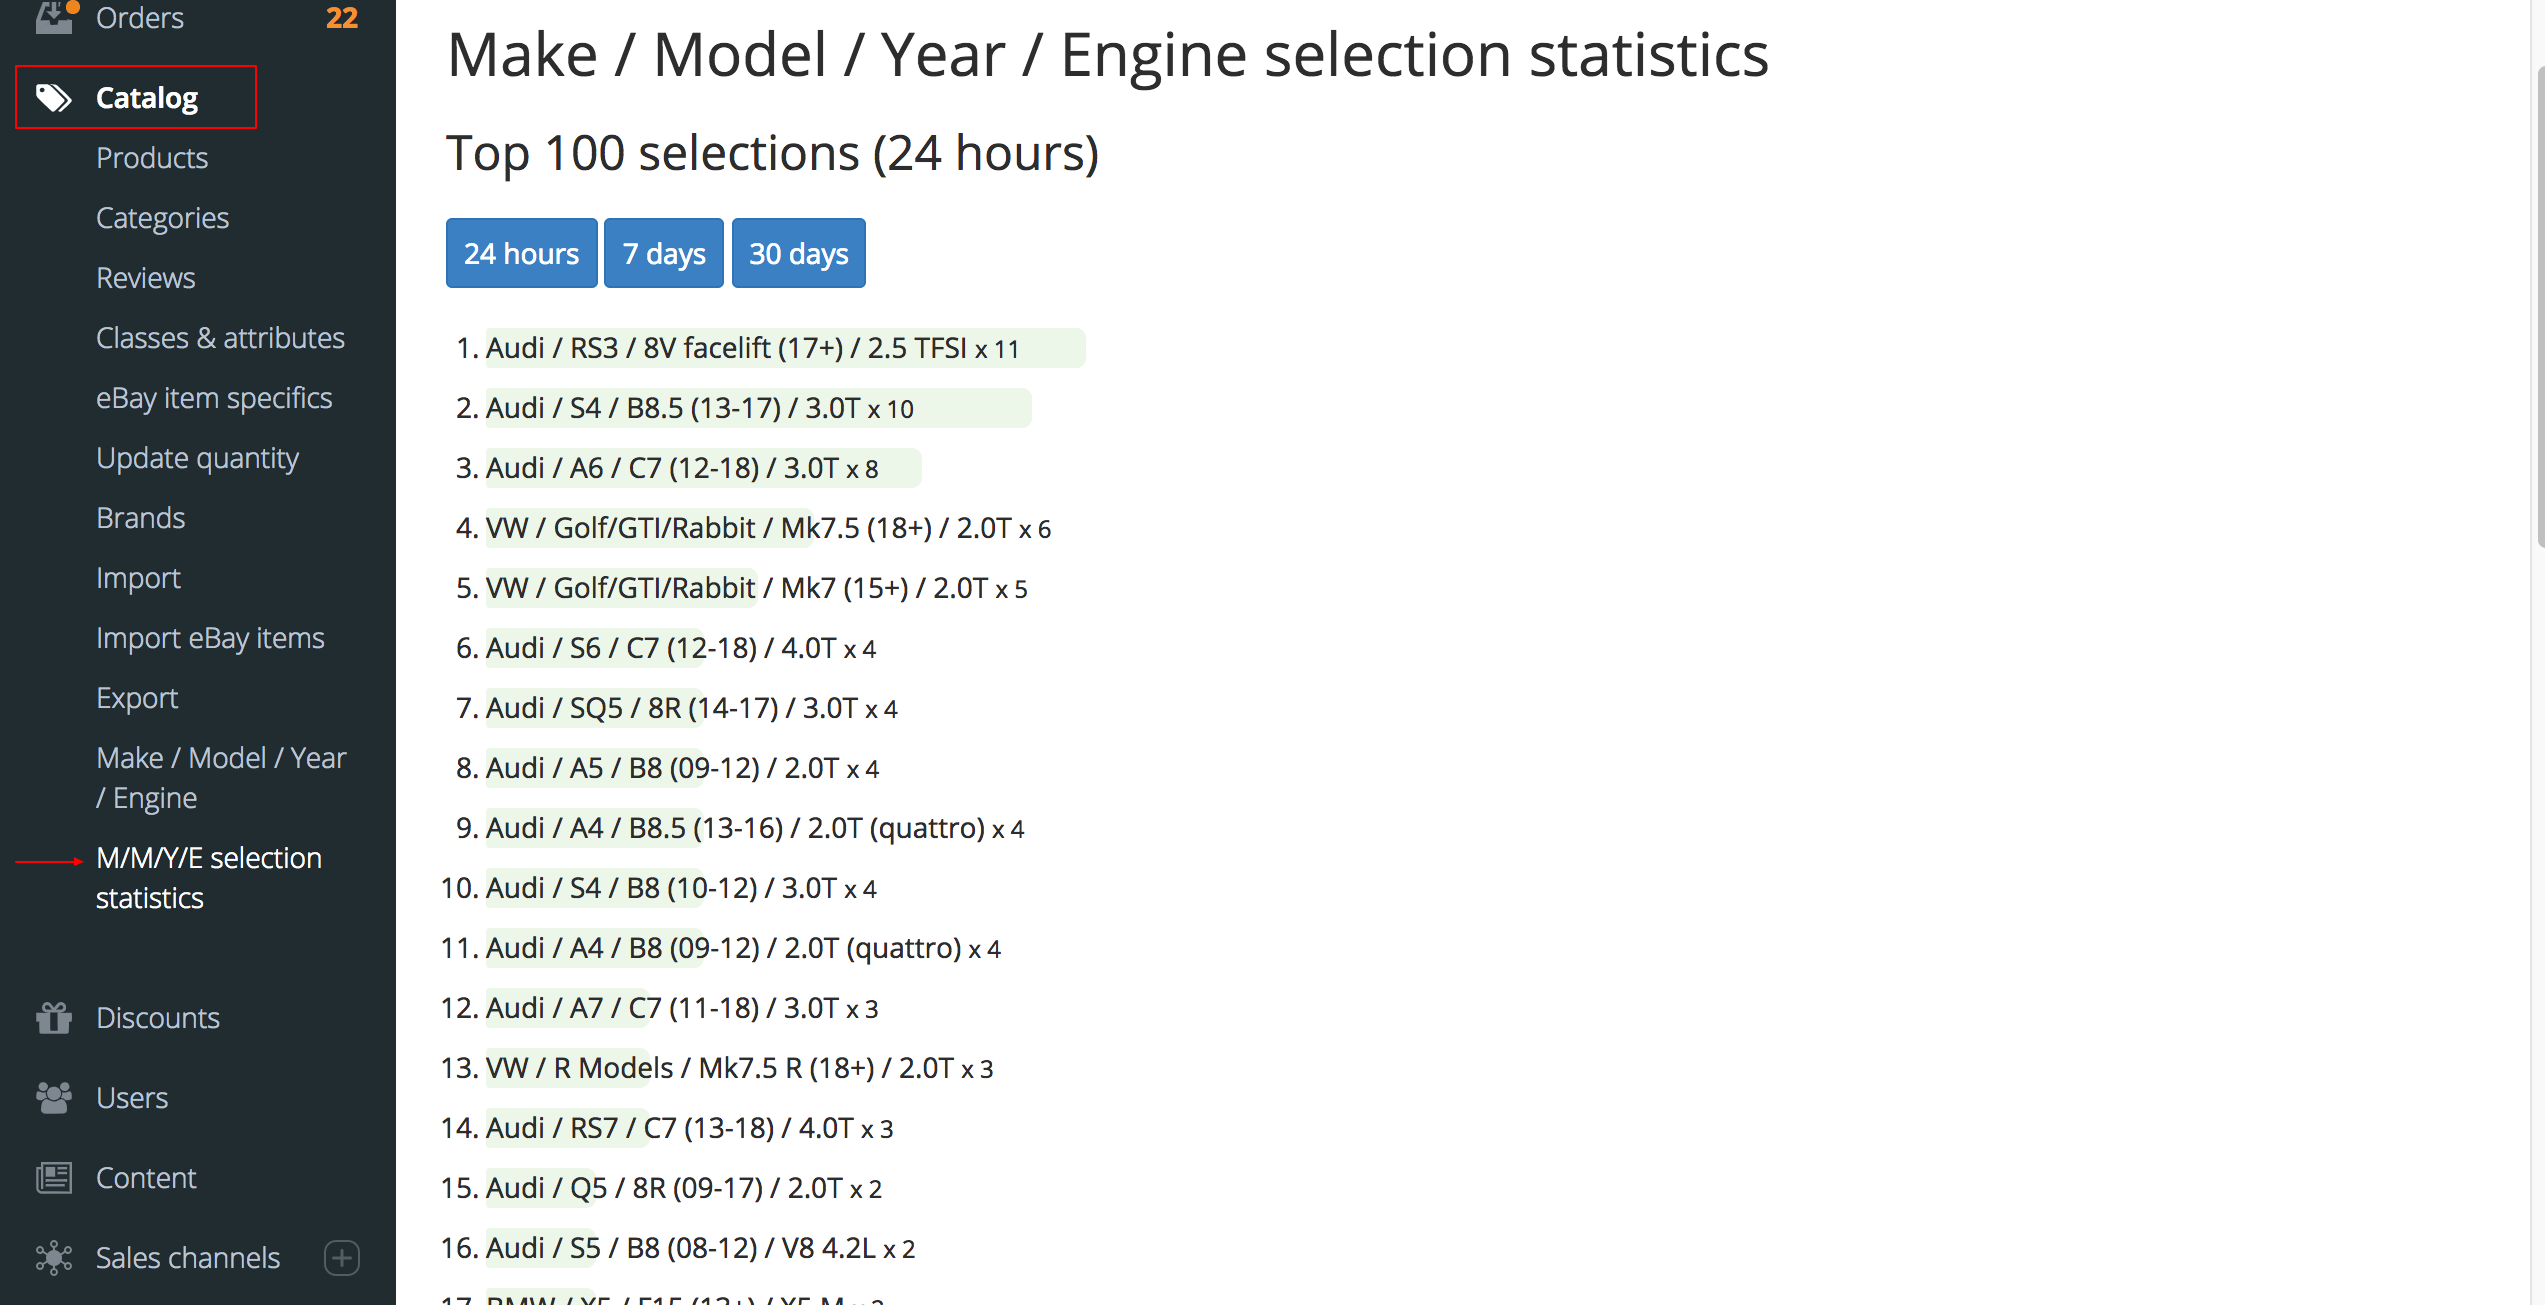 mmye-selection-stats.png